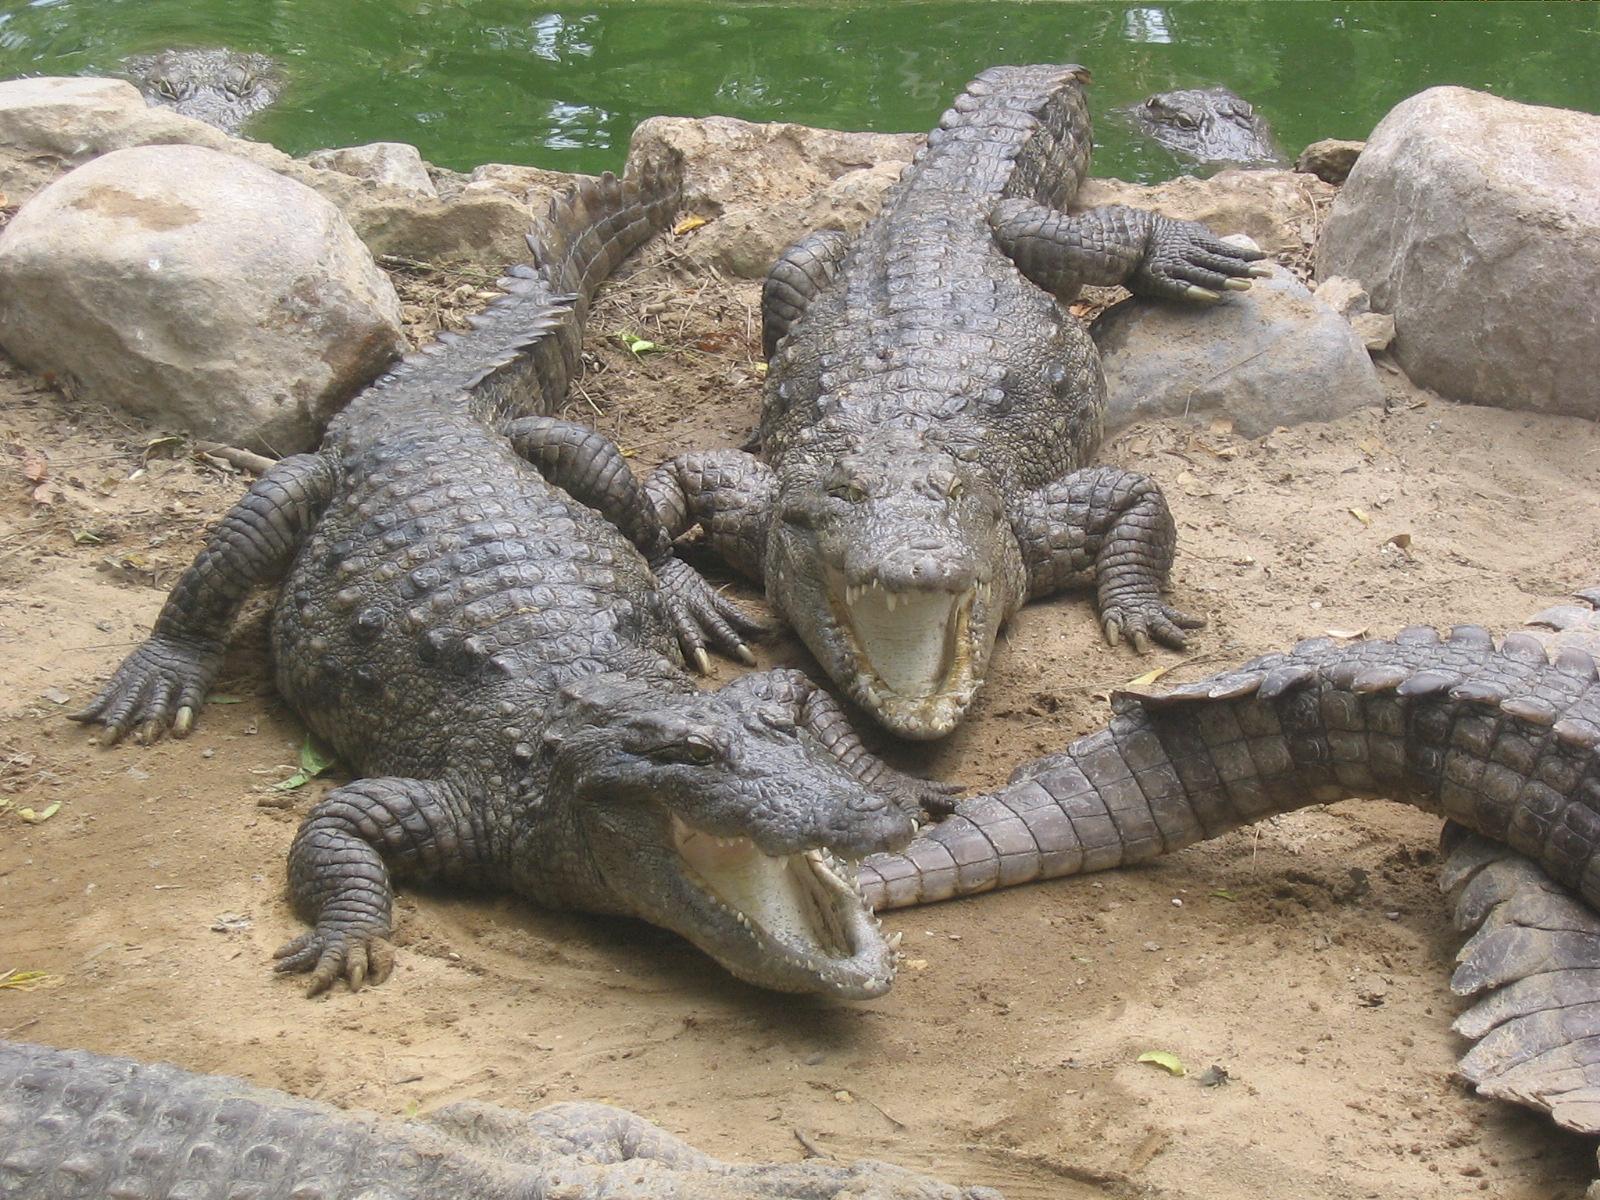 Marsh crocodiles in captivity in CrocBank